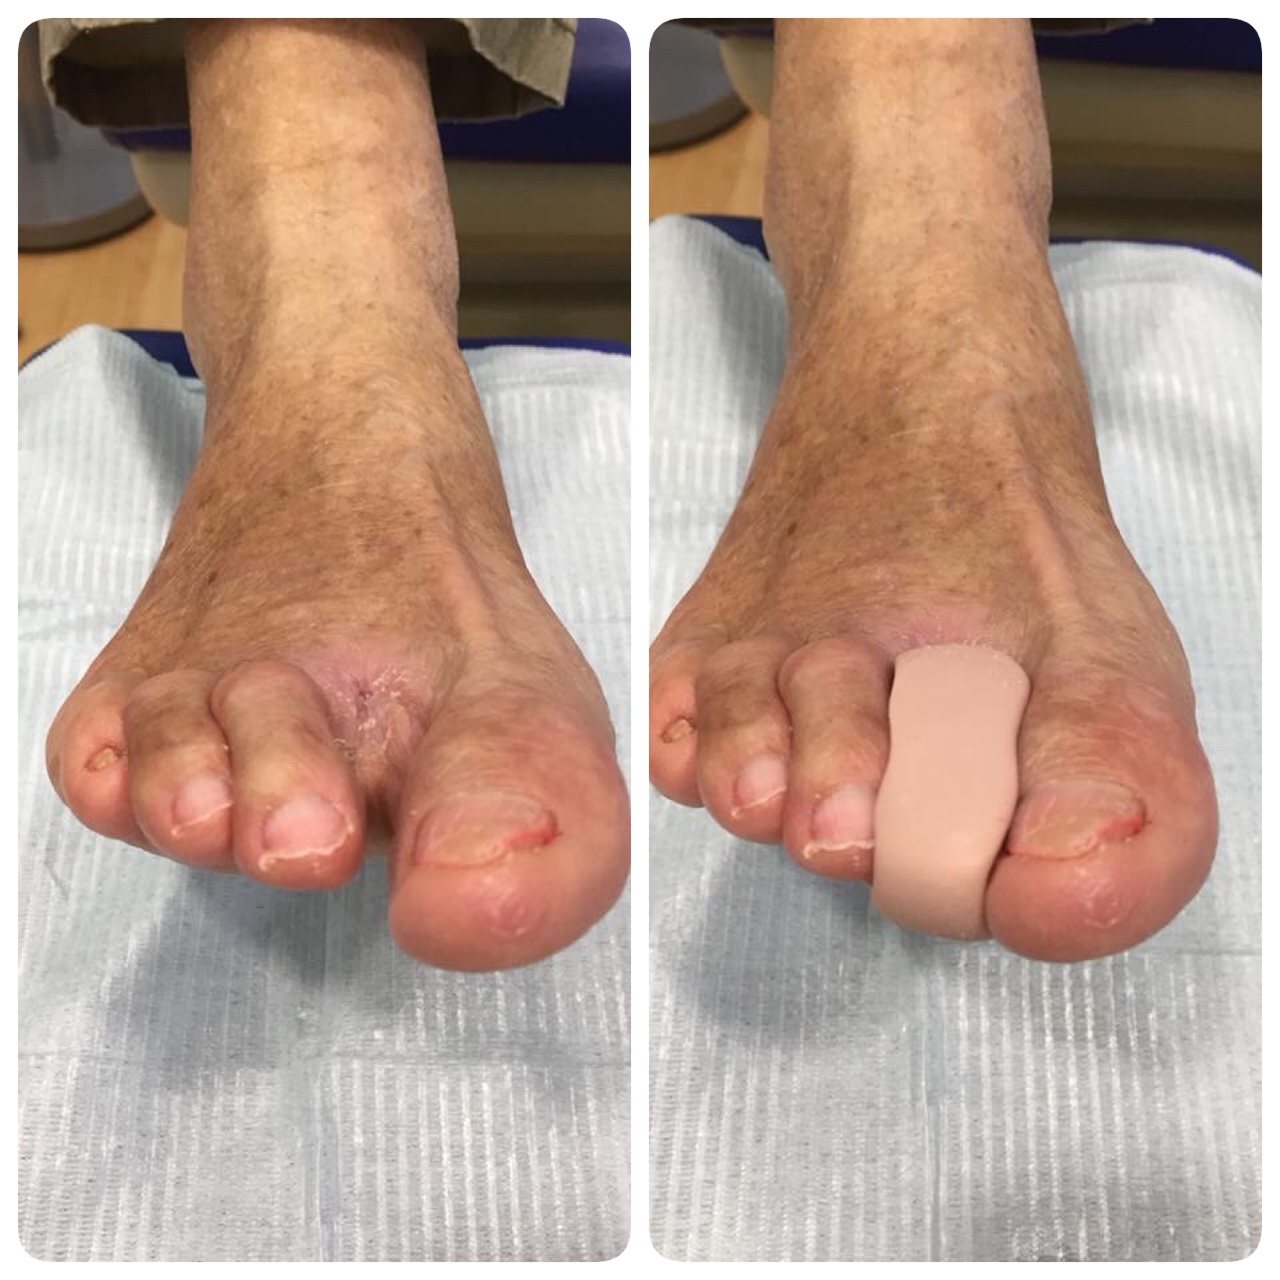 Ortesis de silicona para suplir dedos amputados